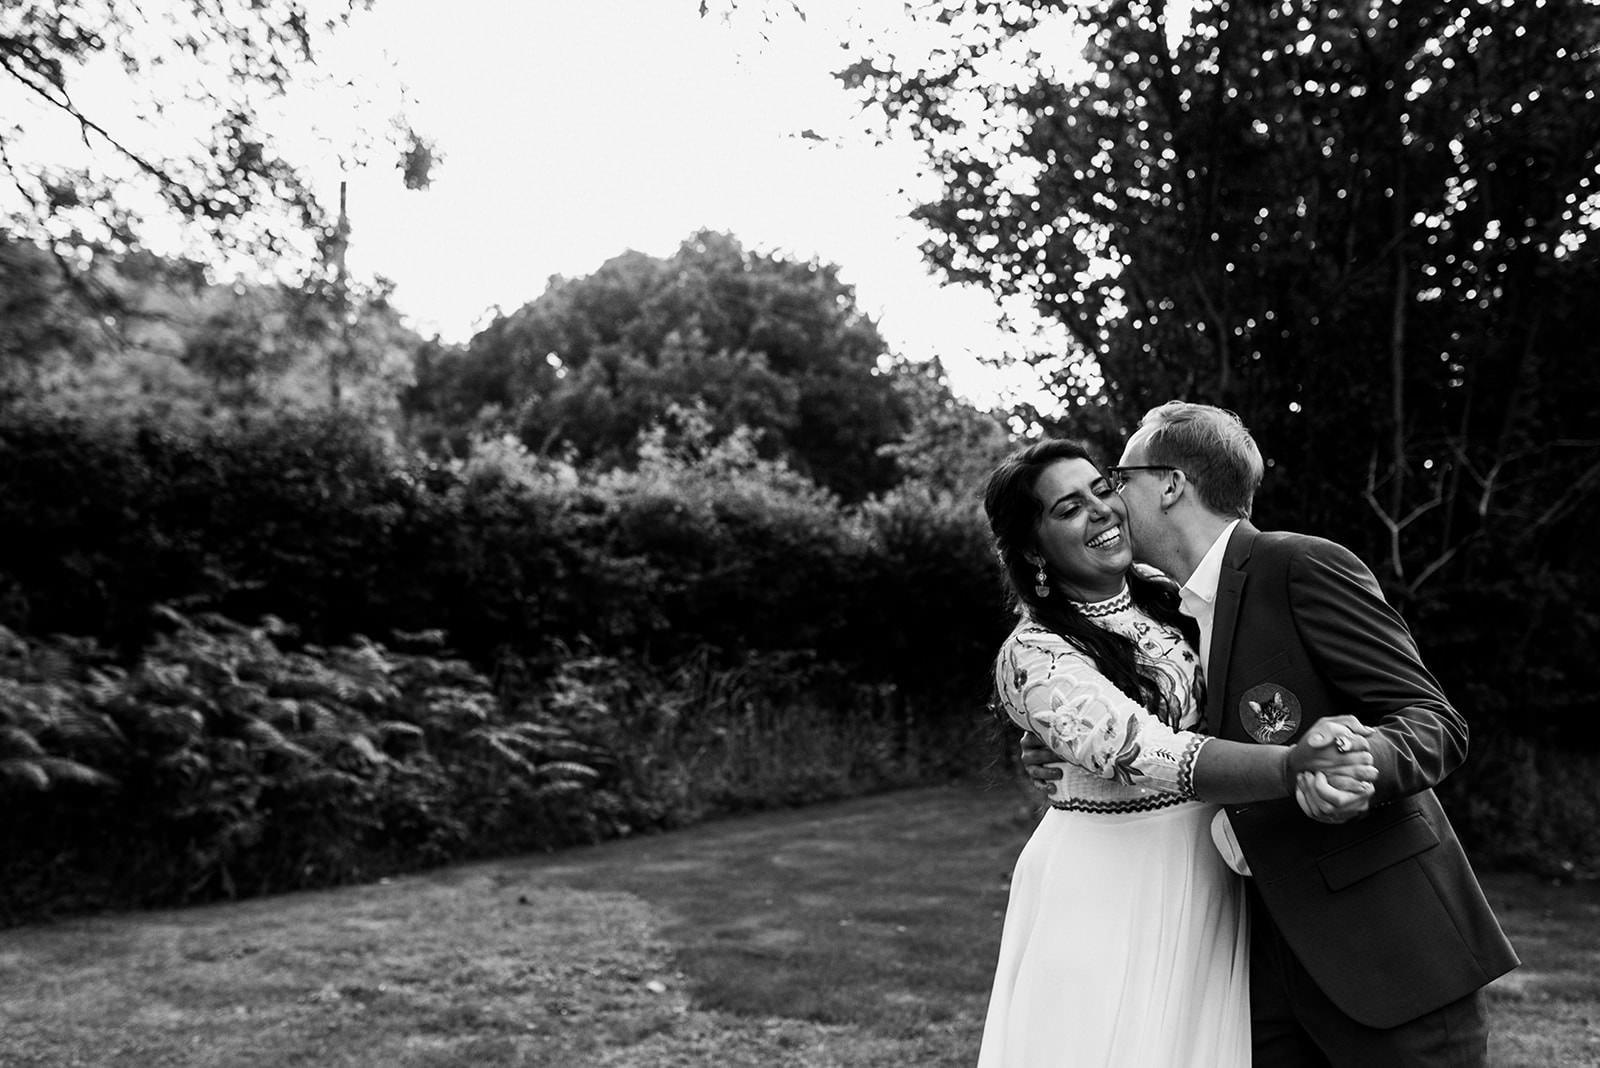 Colourful norfolk wedding photographer